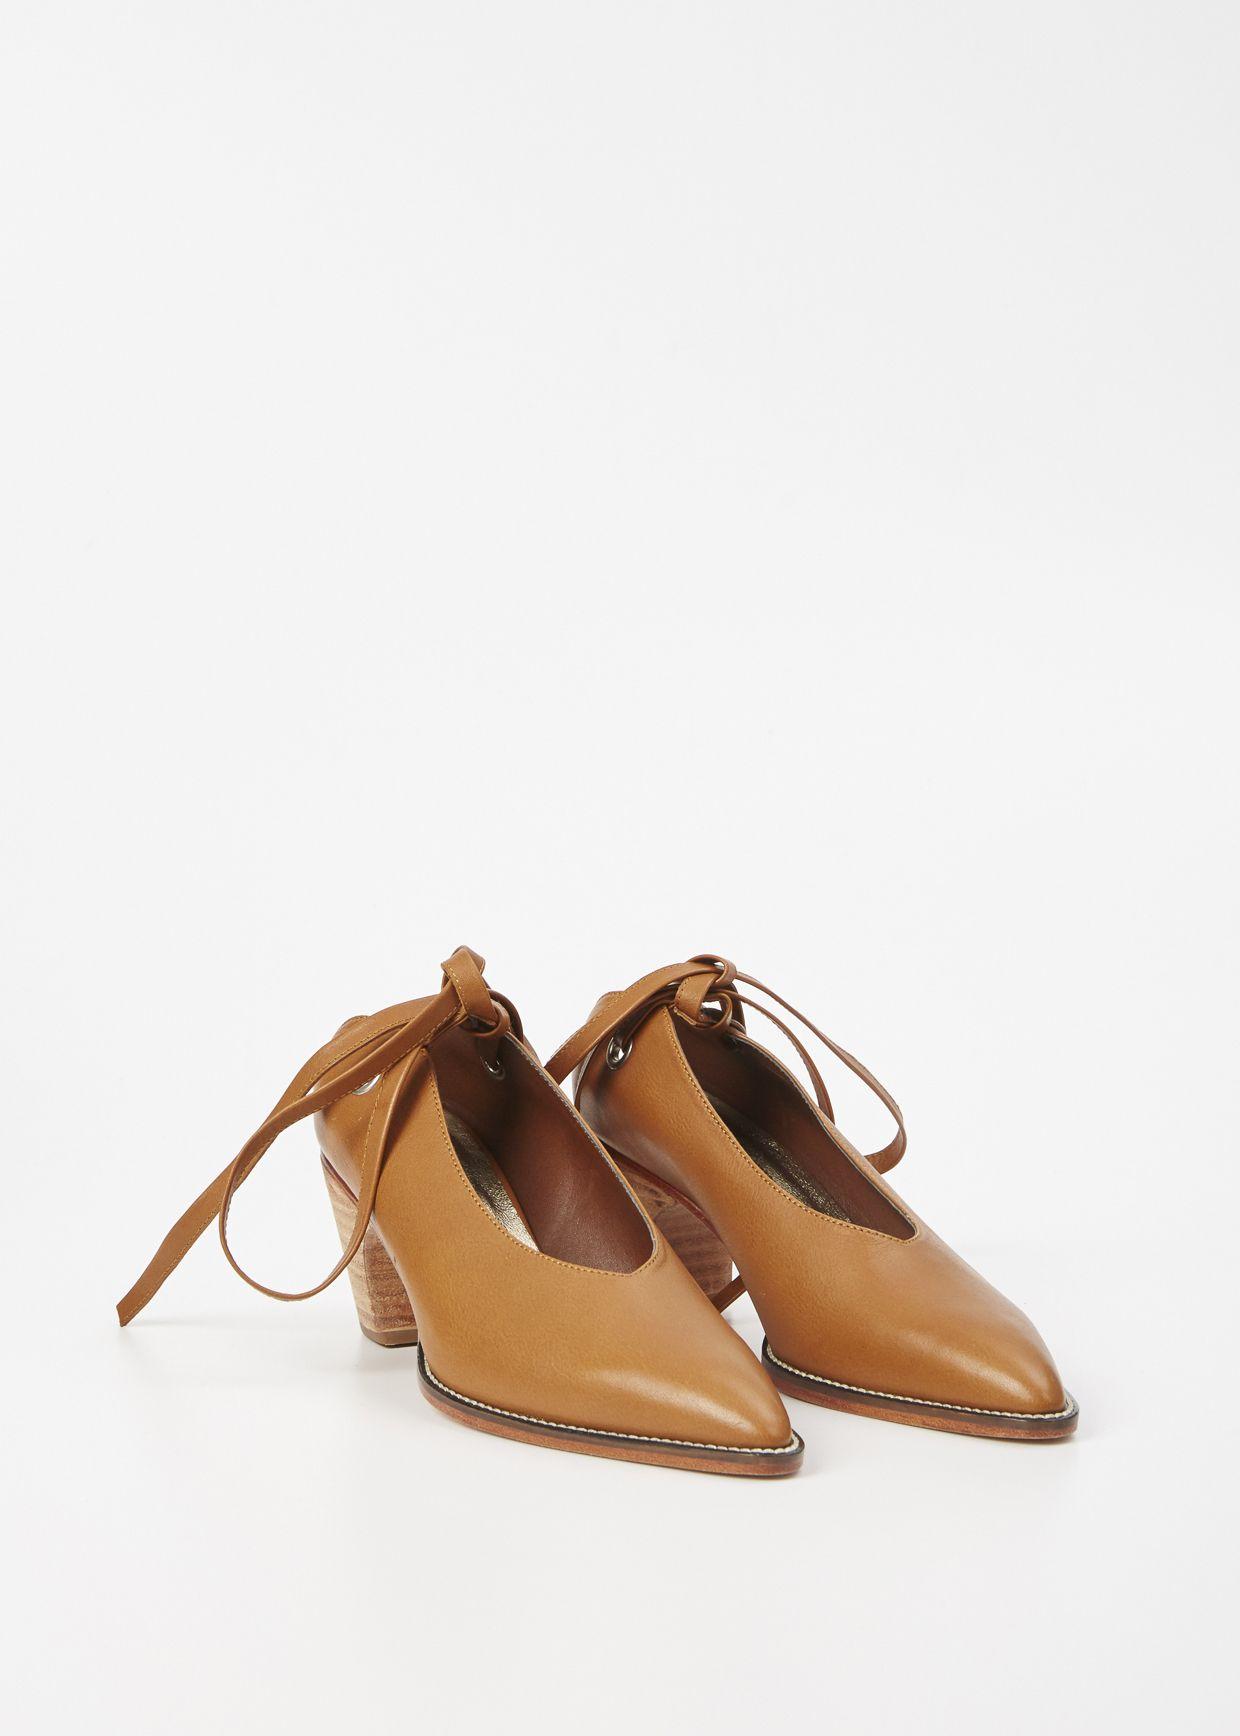 1e975bc4a36 Rachel Comey Fonda Heel (Polished Caramel) | Aesthetic | Heels ...